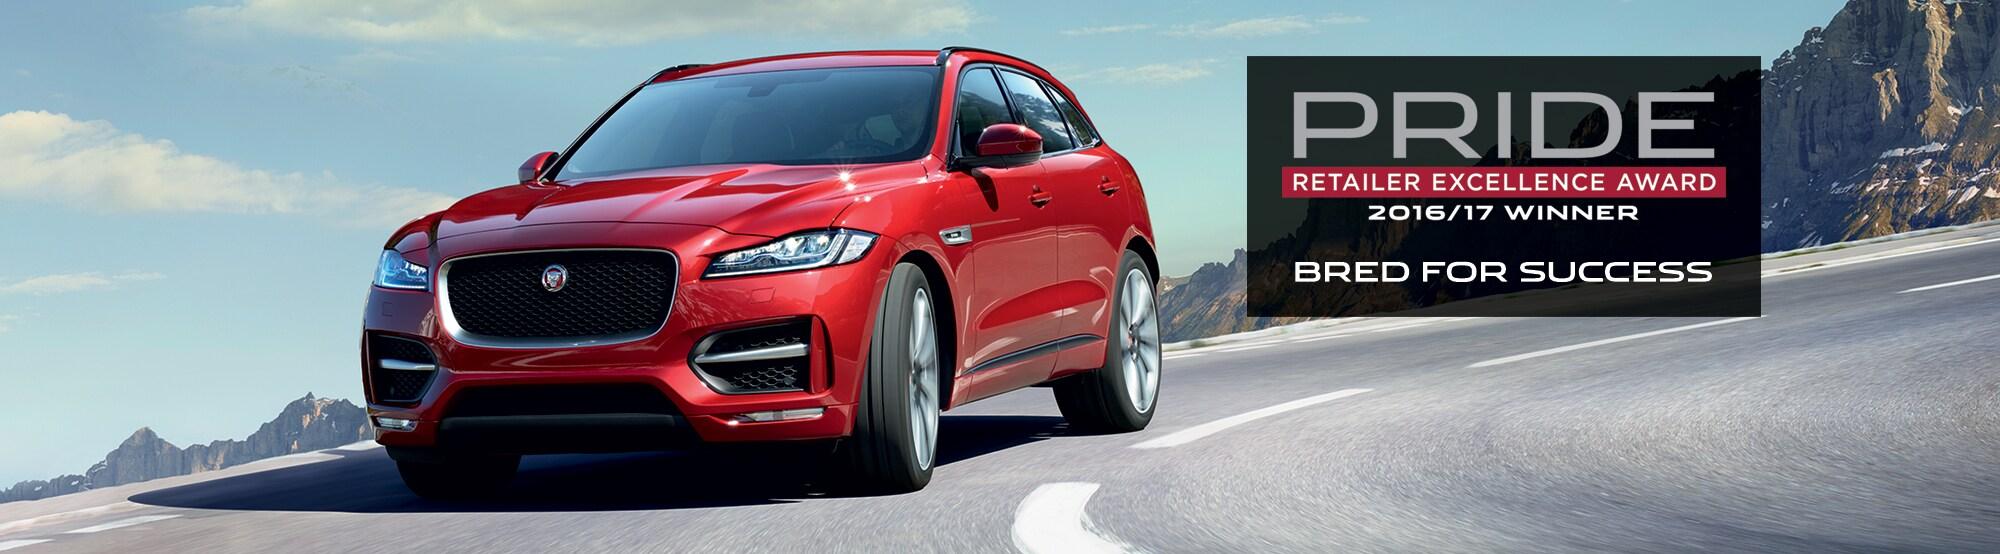 Chicago Illinois Area New 2016 2017 Used Jaguar Dealer